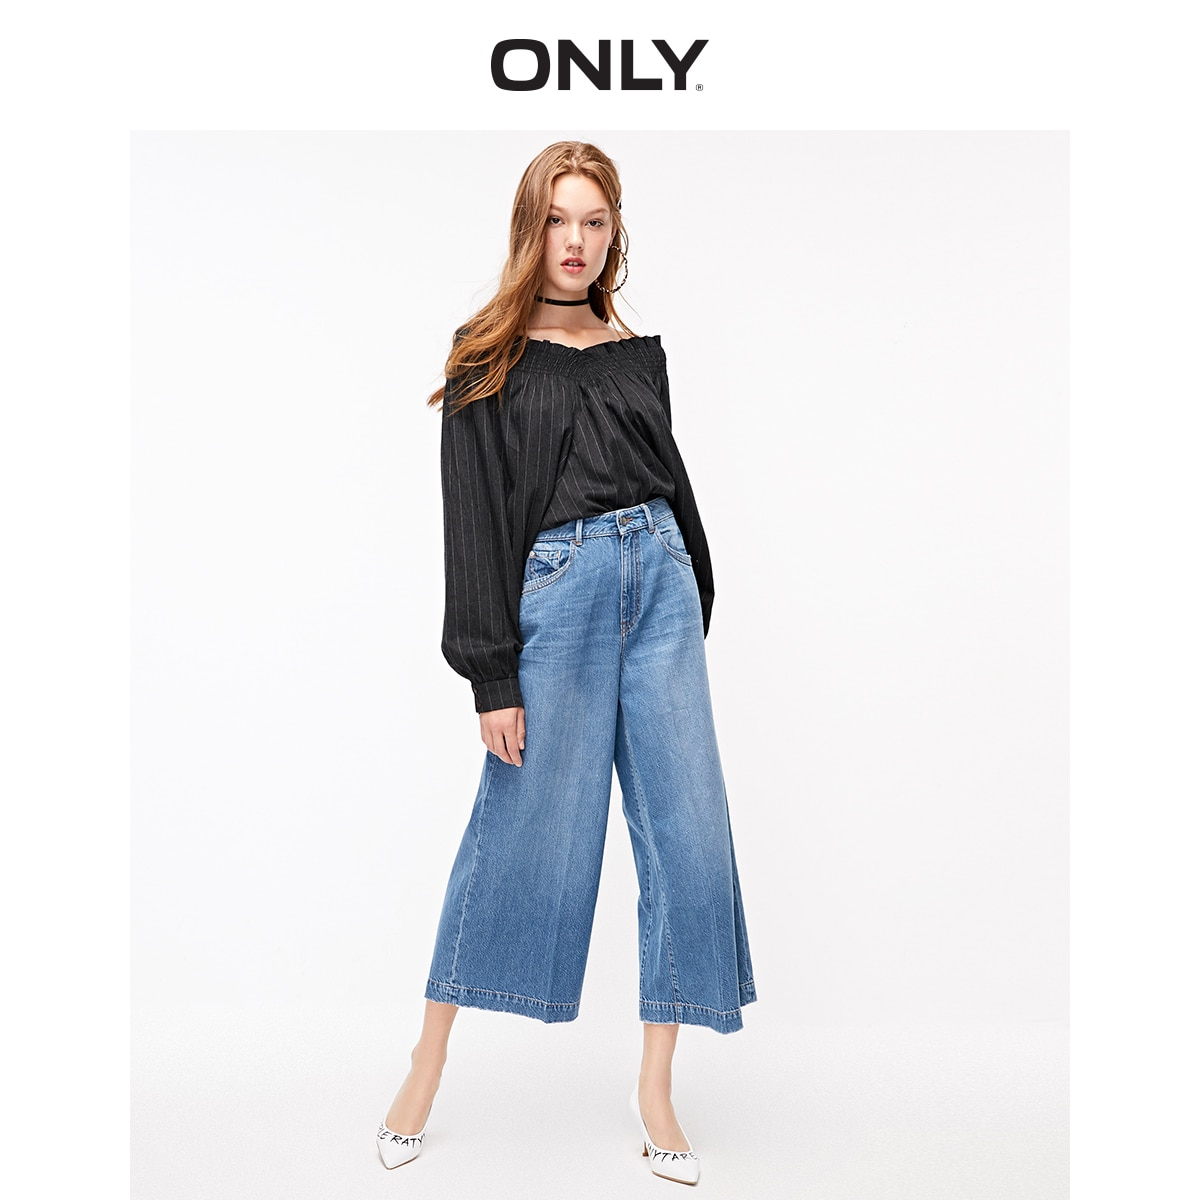 Pantalones Capri de pierna ancha de tiro alto solo sueltos   11936I502